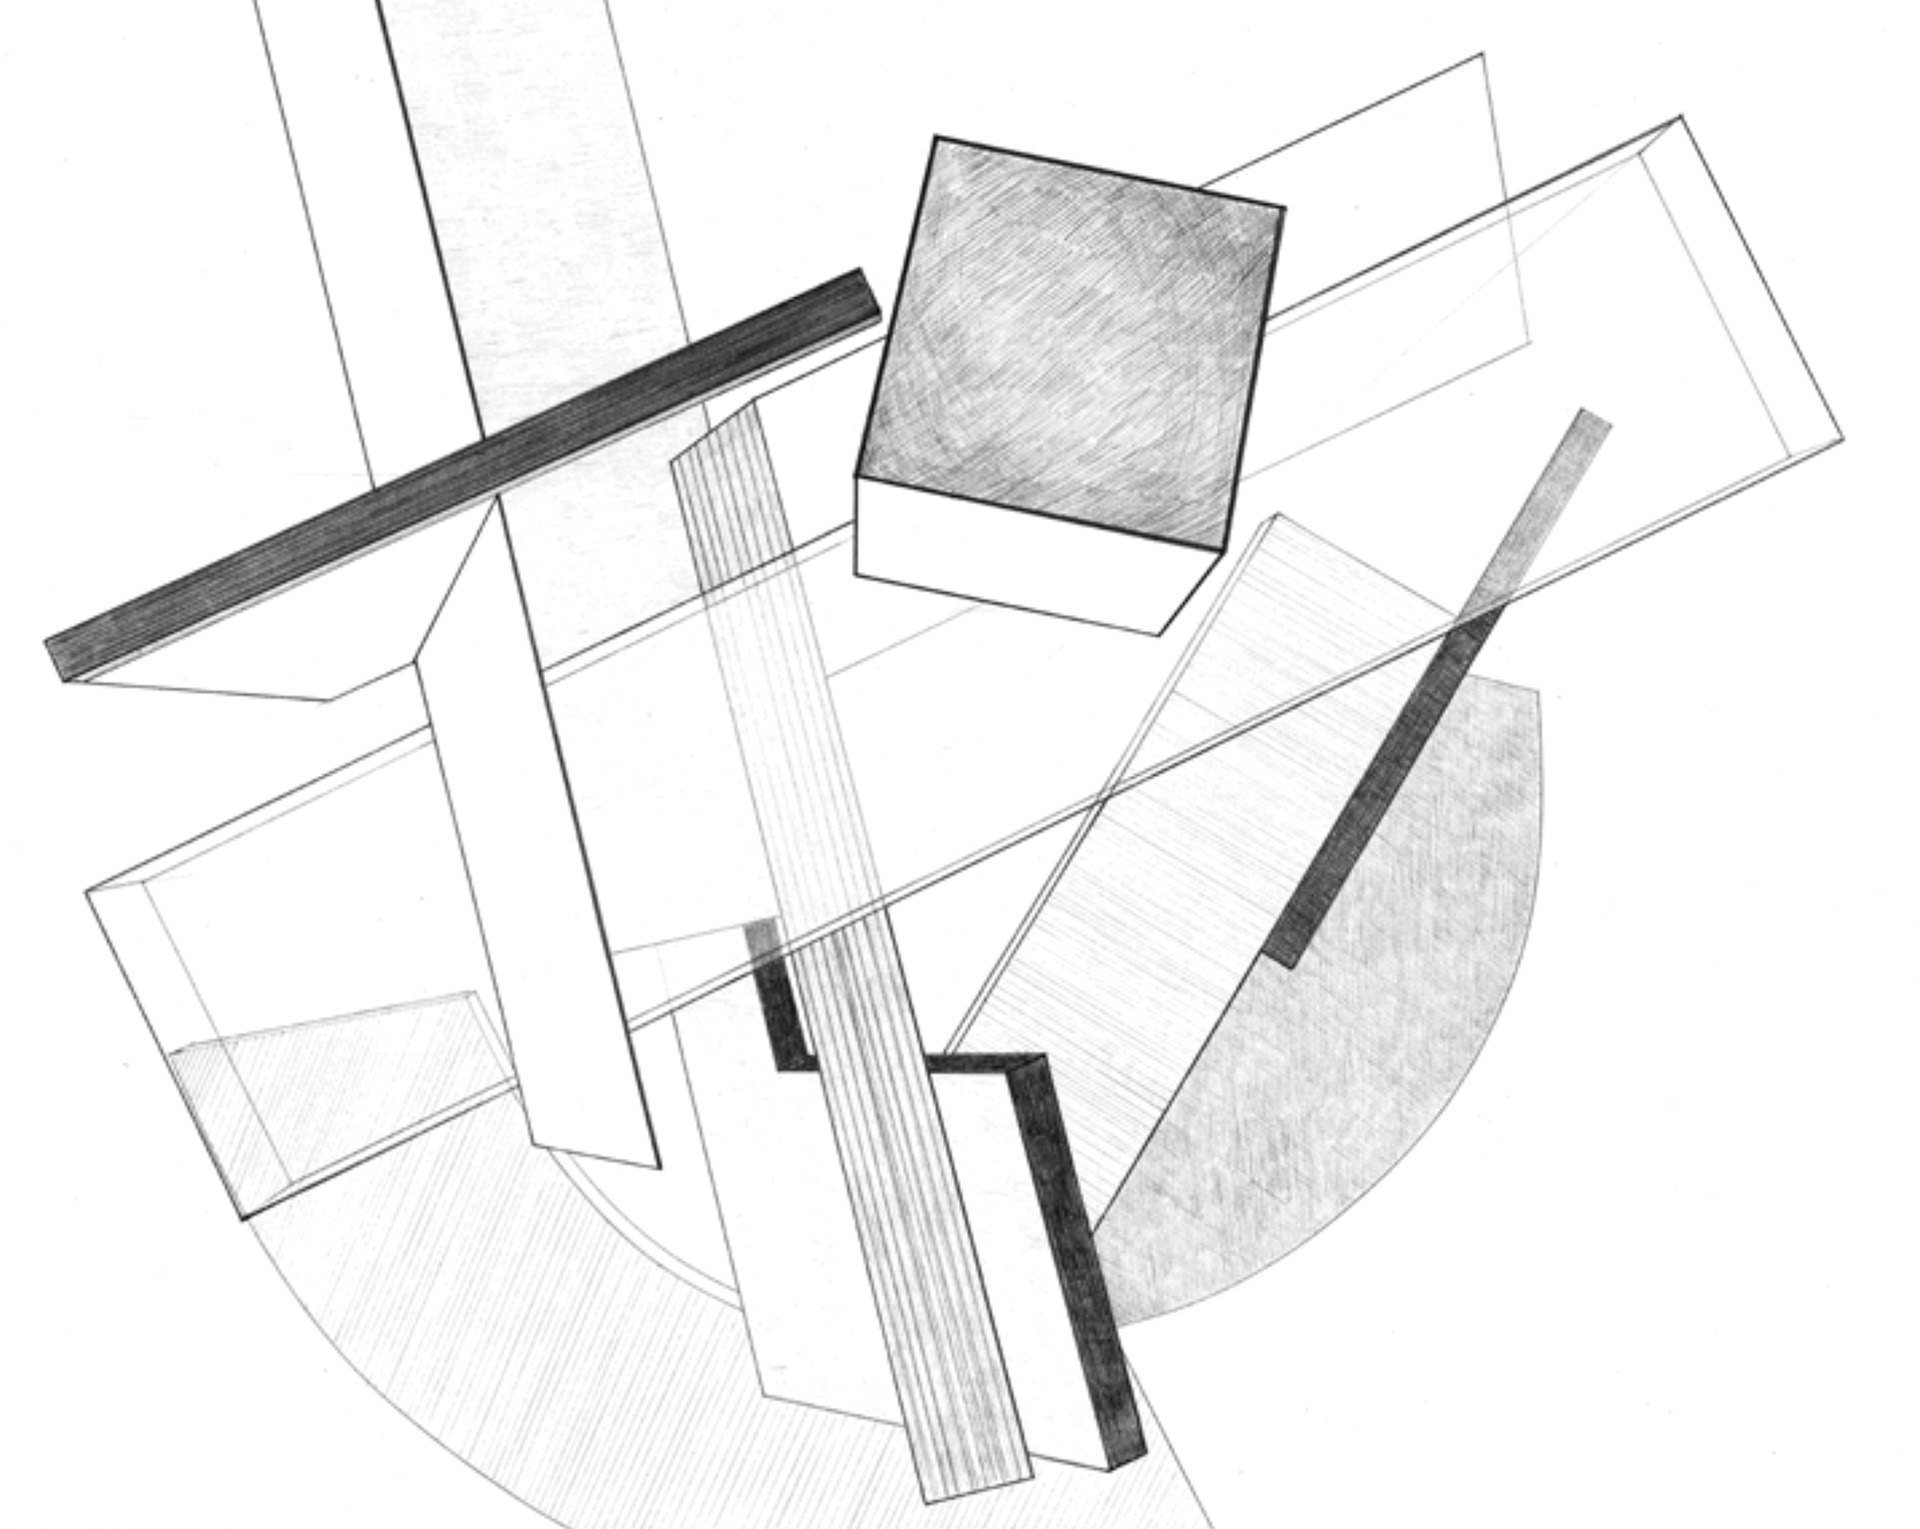 Enlarge Photo: 'Fabricating Landscape'. By WONG Sze Lee Ceci .